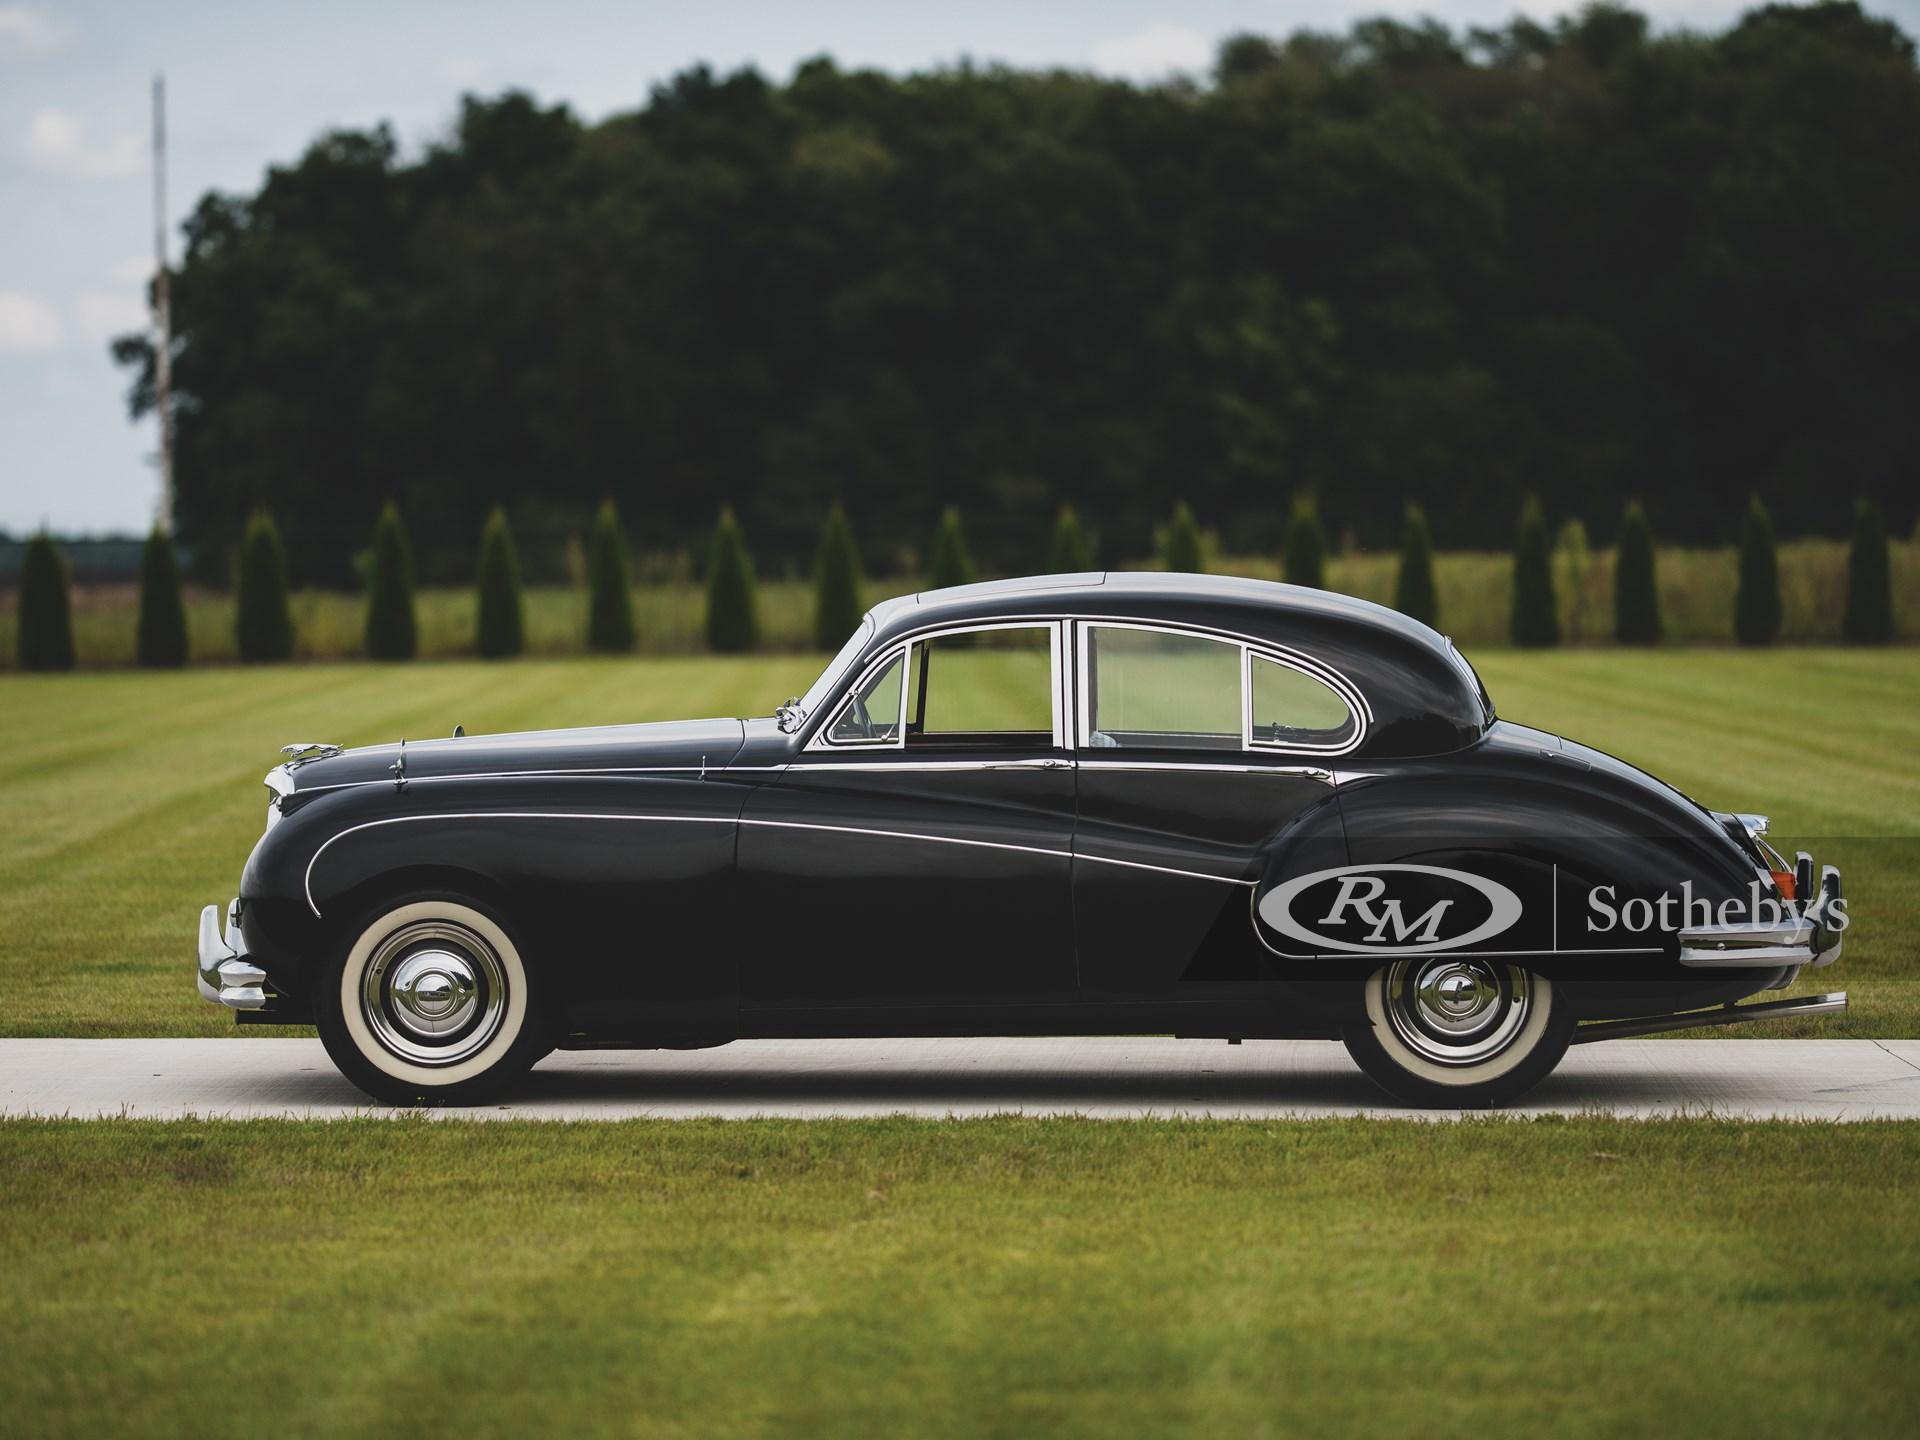 1957 Jaguar Mark VIII   The Elkhart Collection   RM Sotheby's